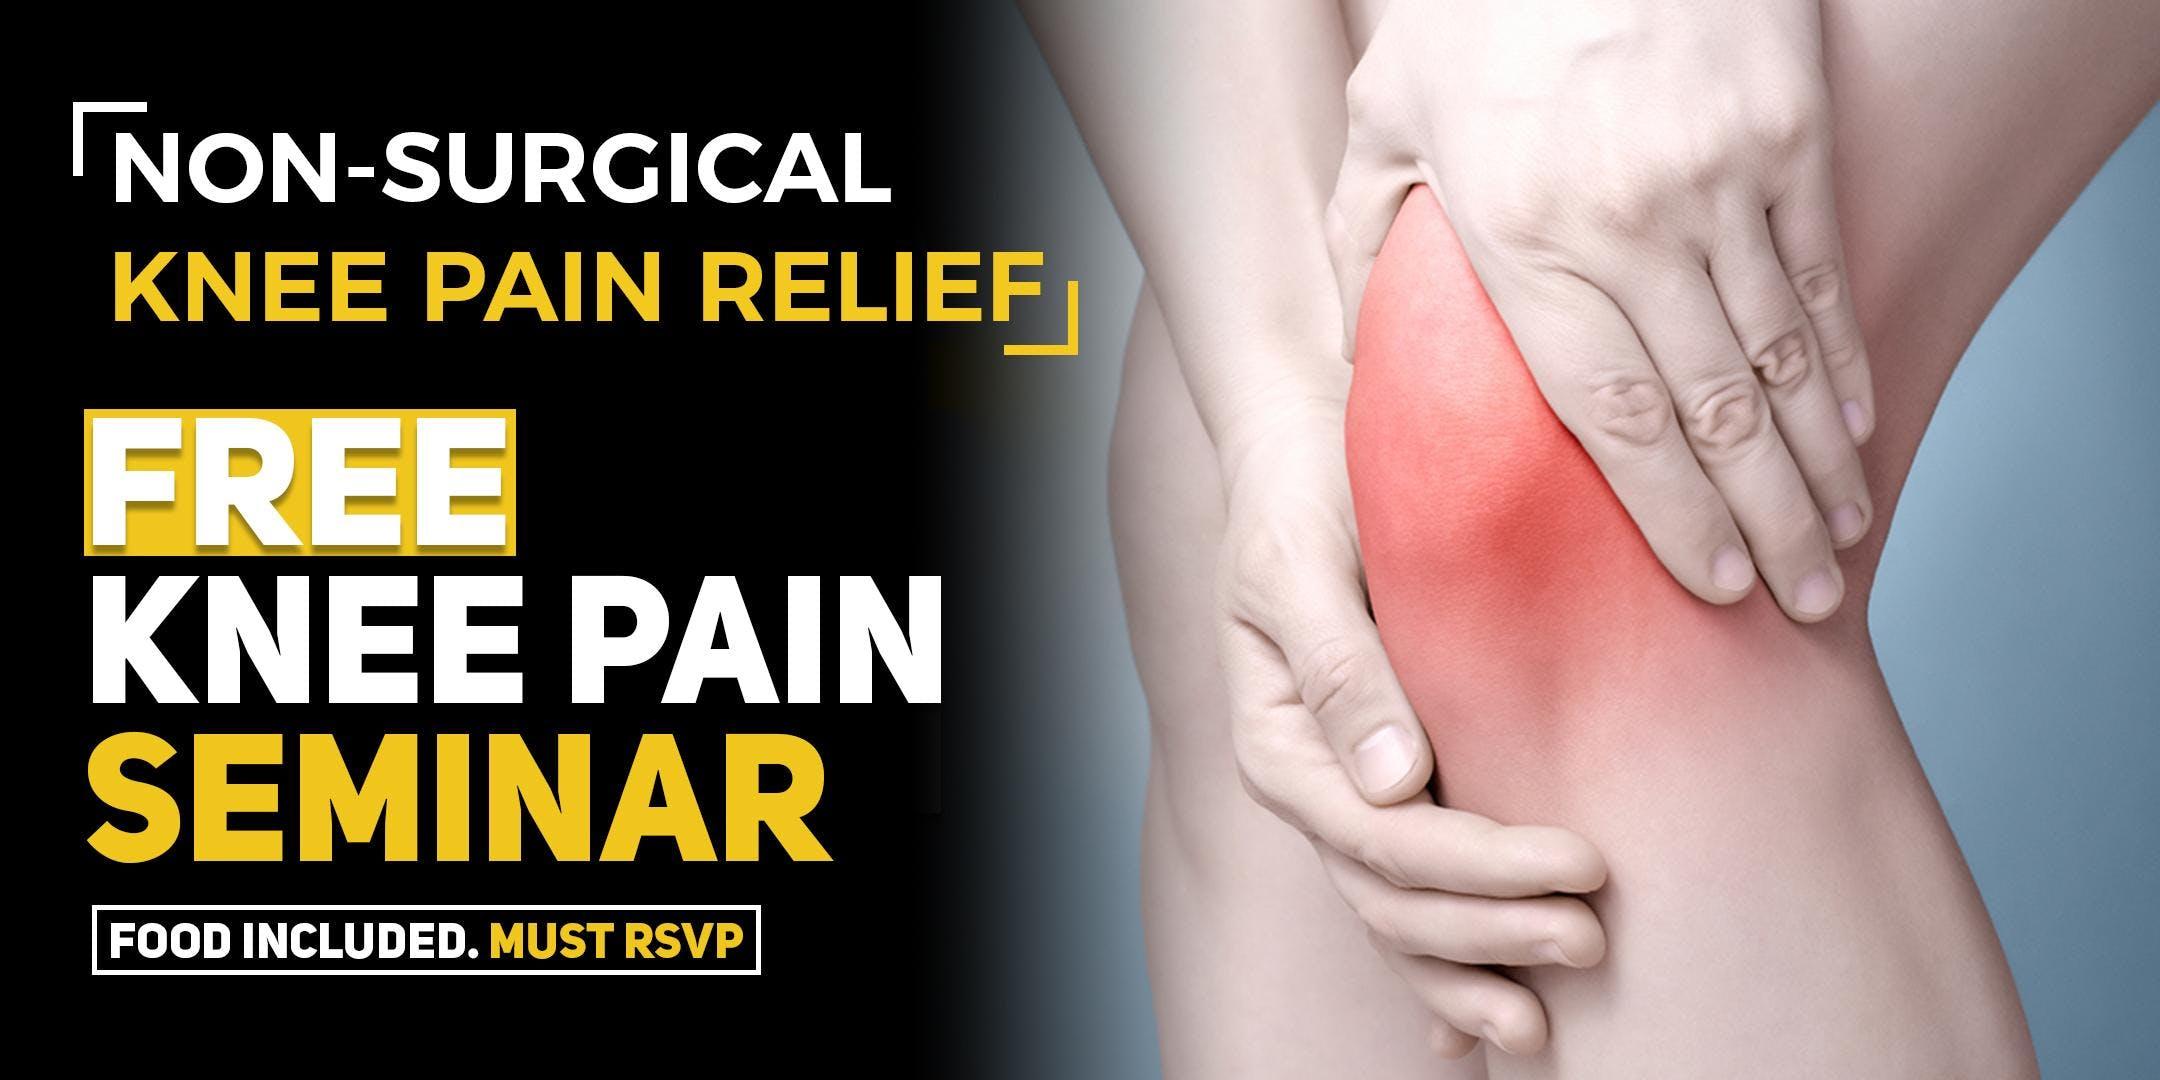 FREE Non-Surgical Knee Pain Relief Seminar - Phoenix, AZ 1/29